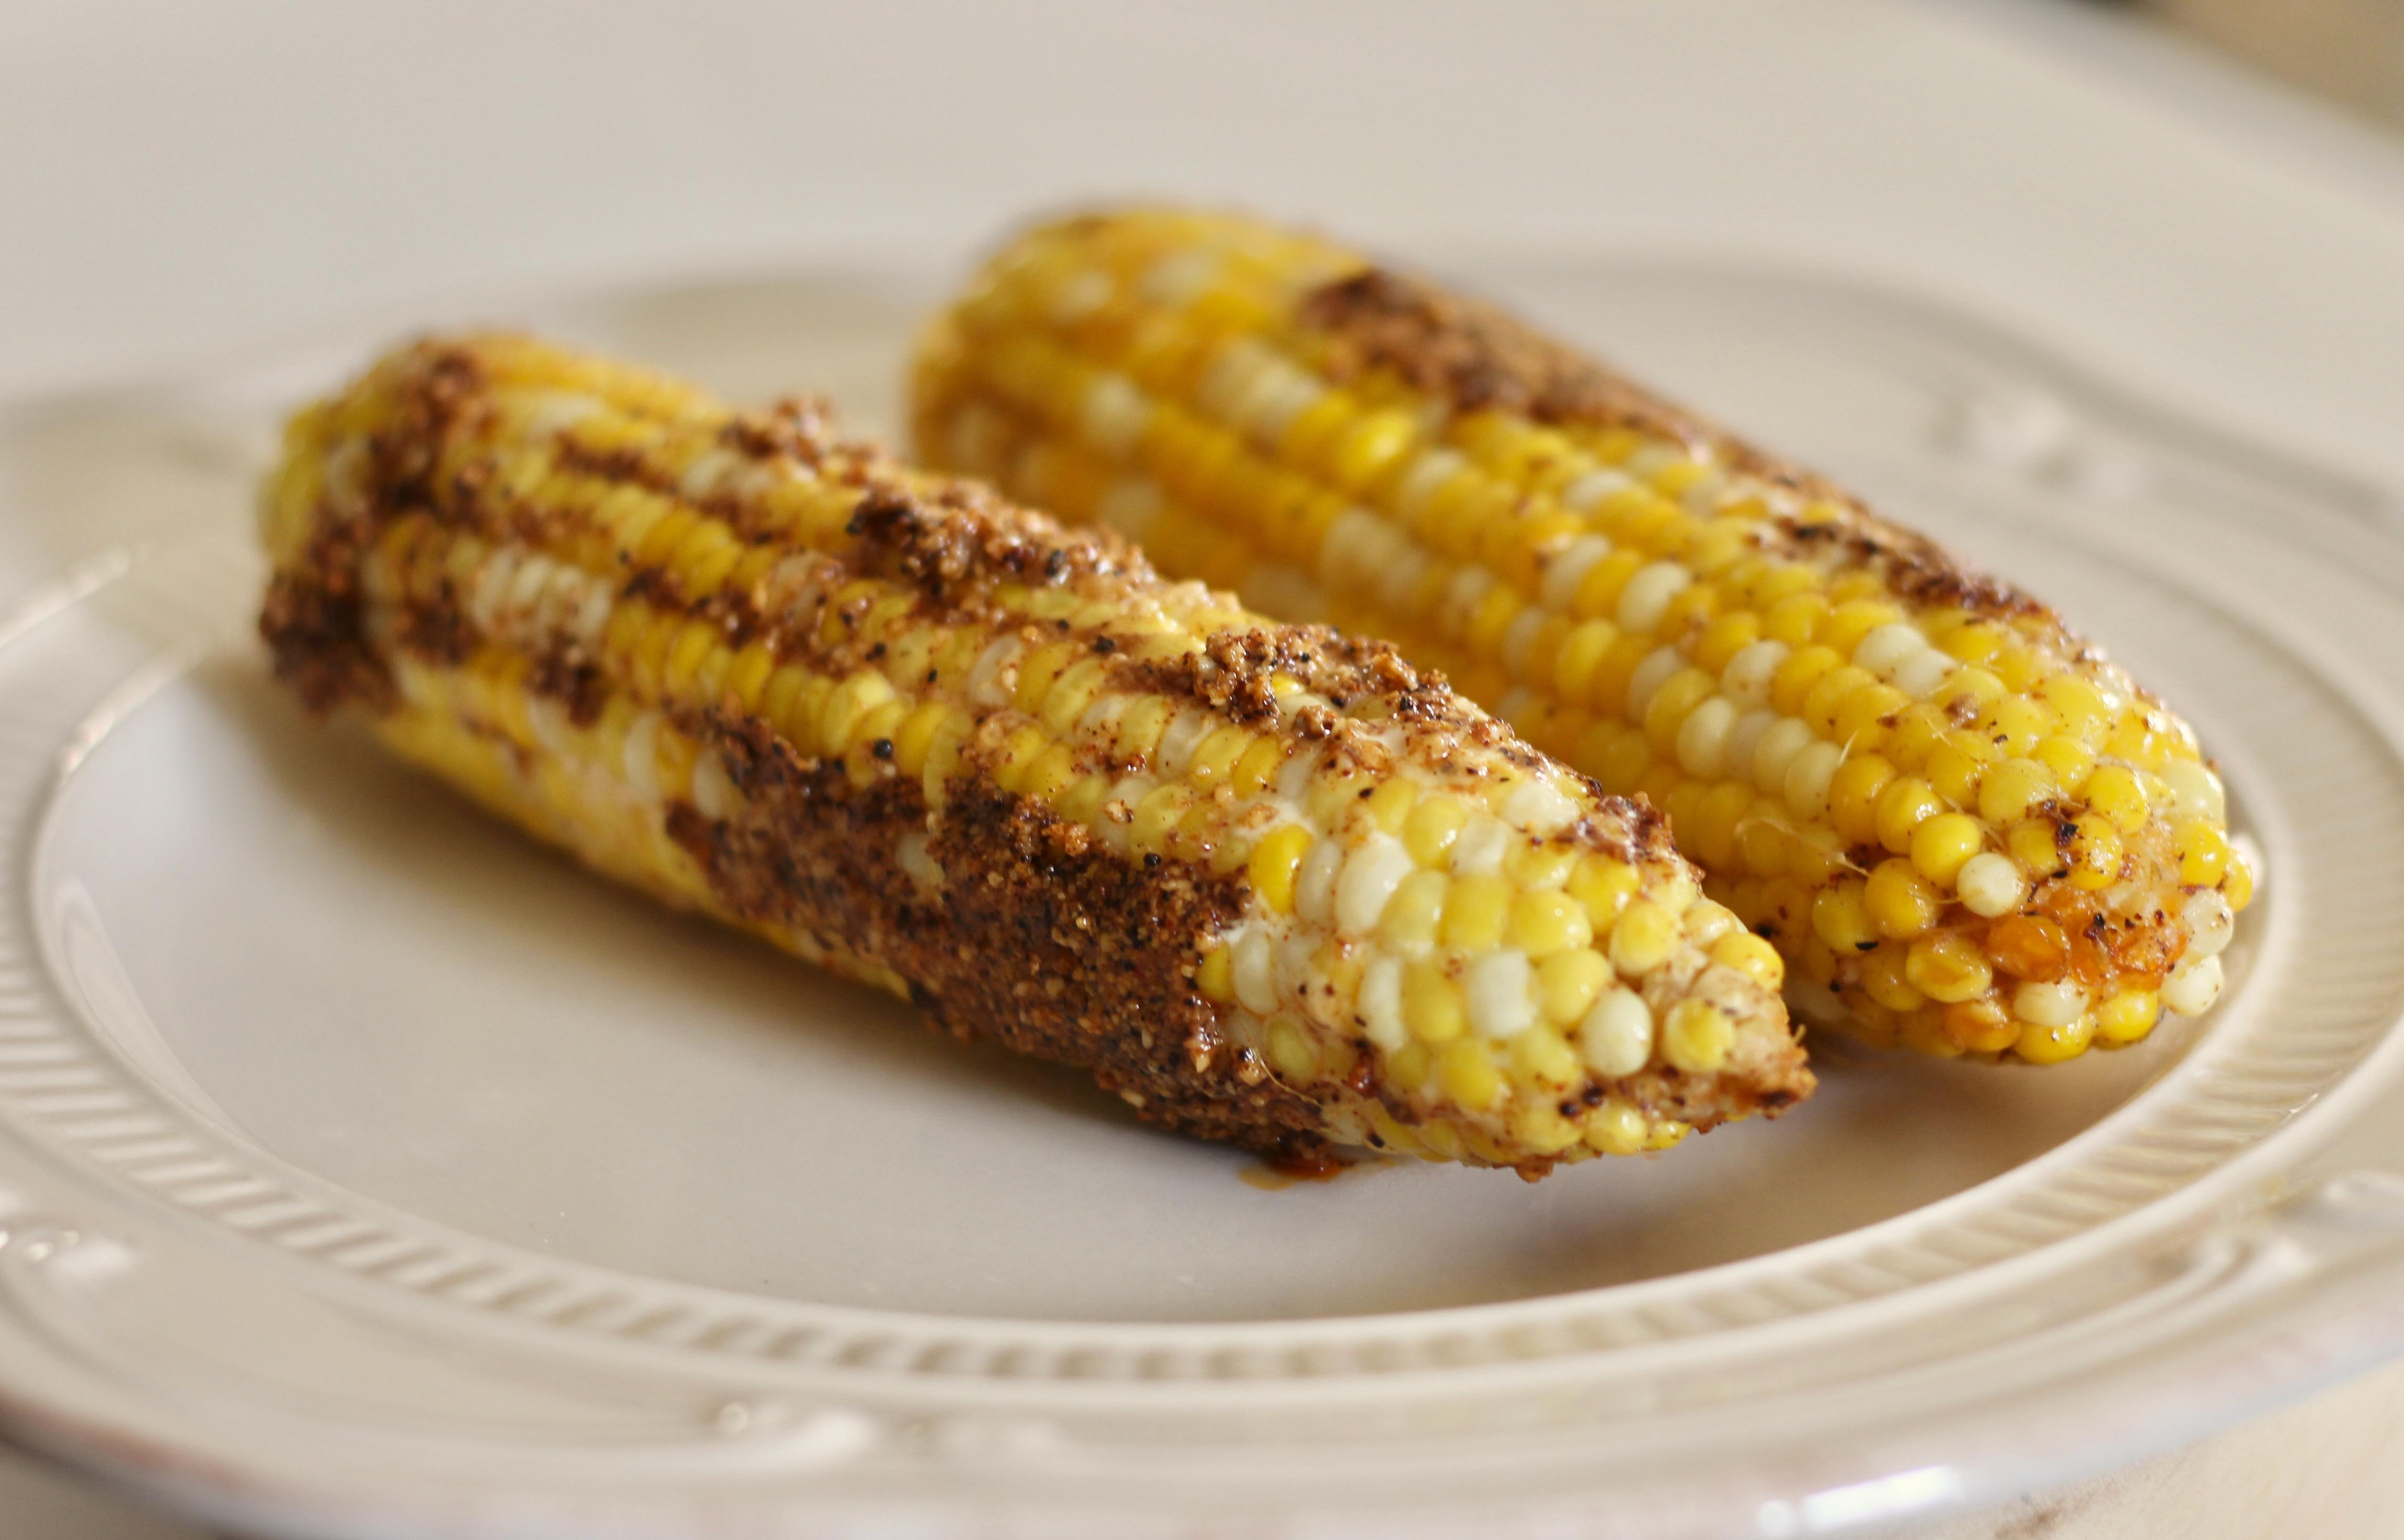 Parmesan Roasted Corn on the Cob